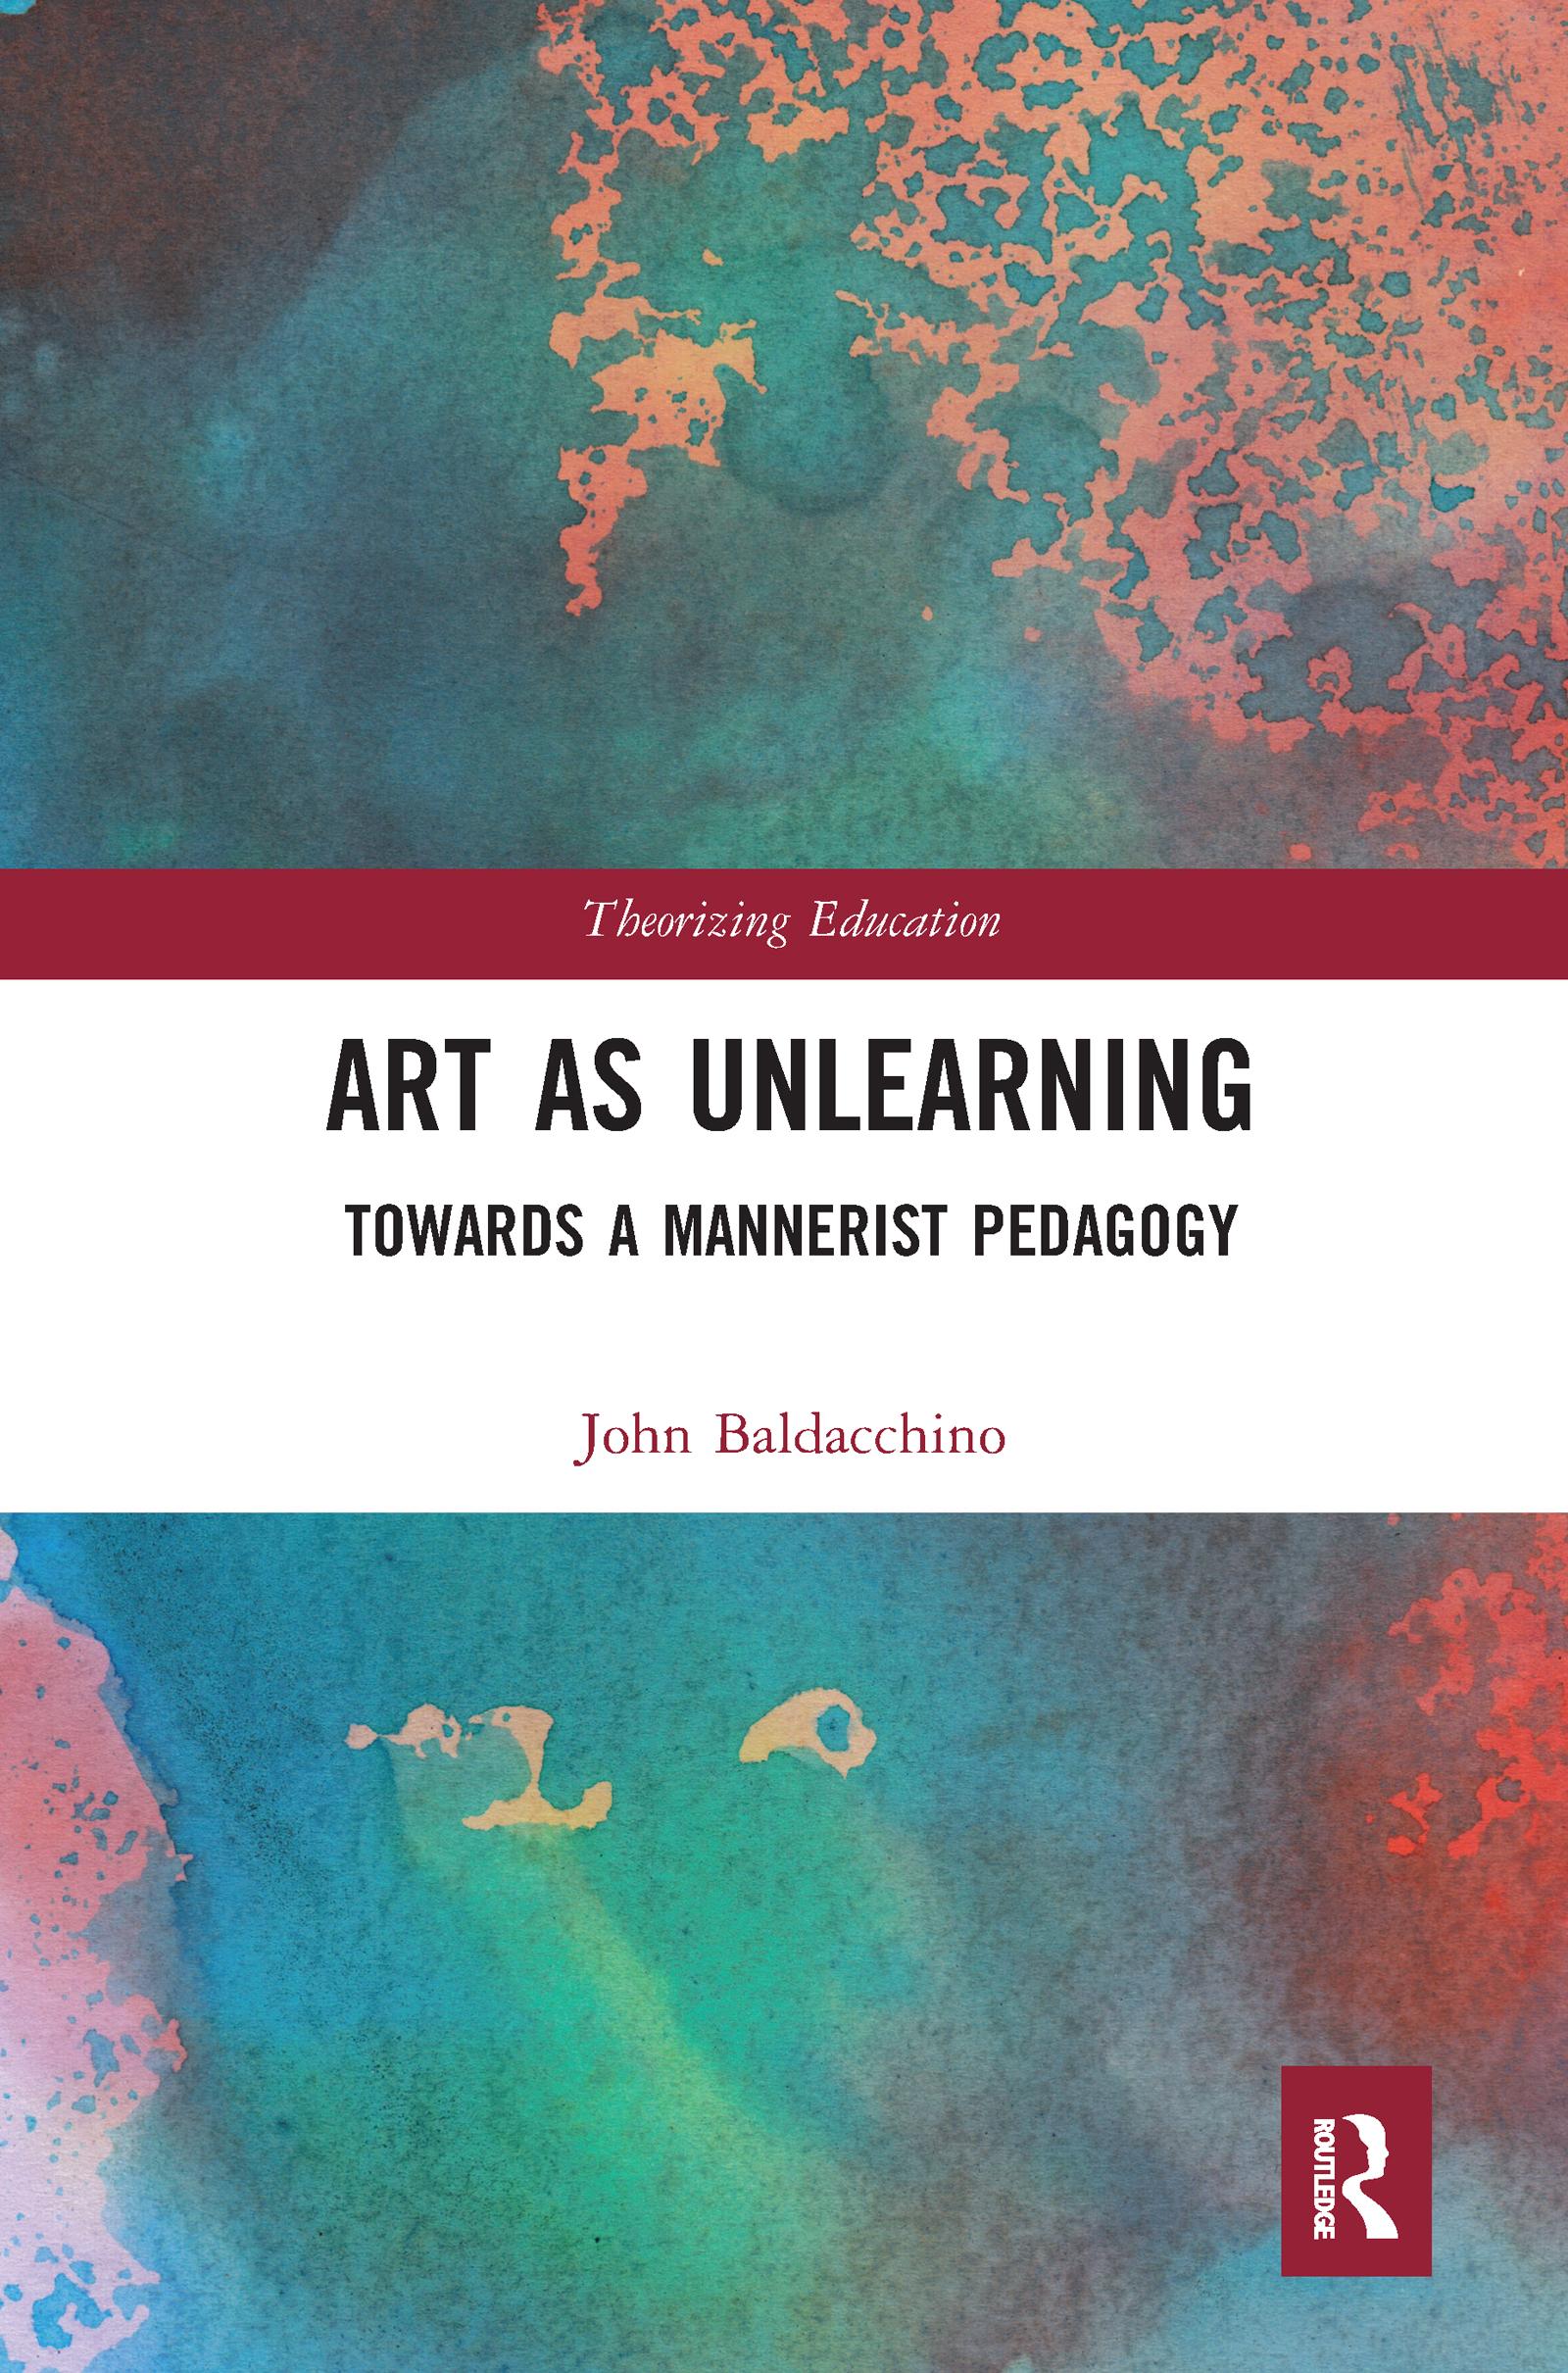 Art as Unlearning